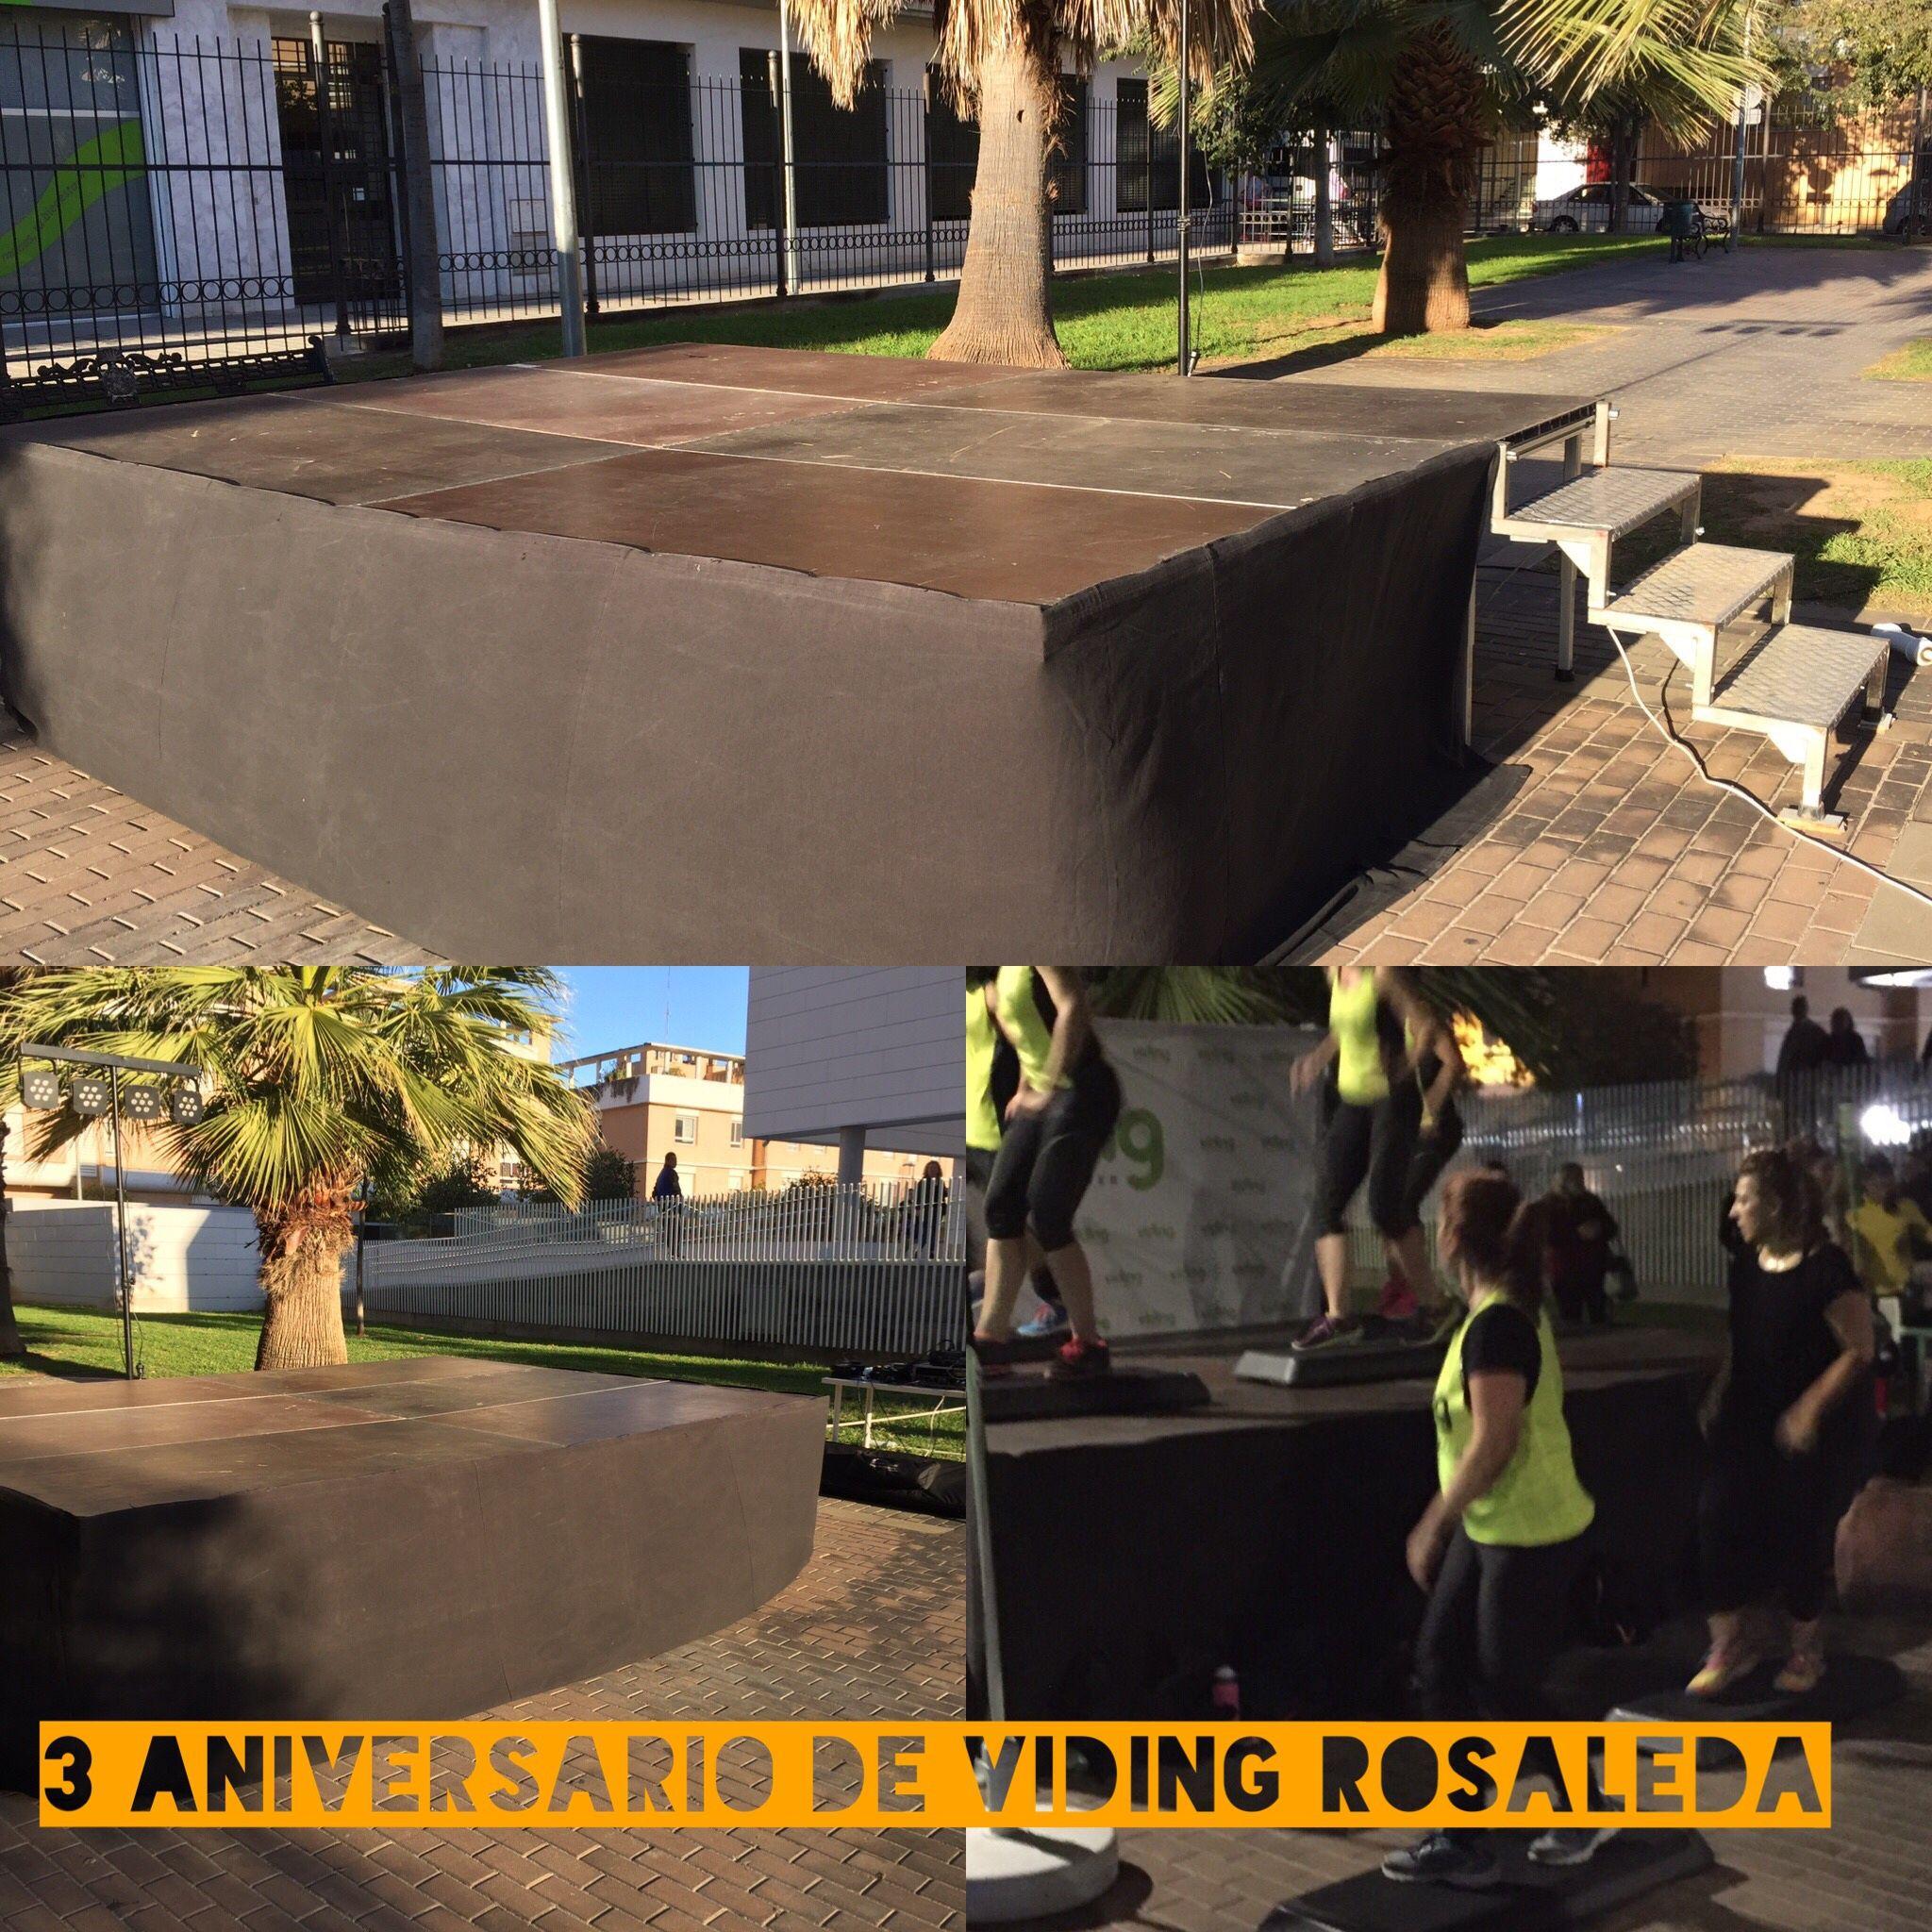 Gracias al centro deportivo Viding Rosaleda 🏊 ♀ 🏋 ♀️de  Sevilla 2f450ff2f9c70